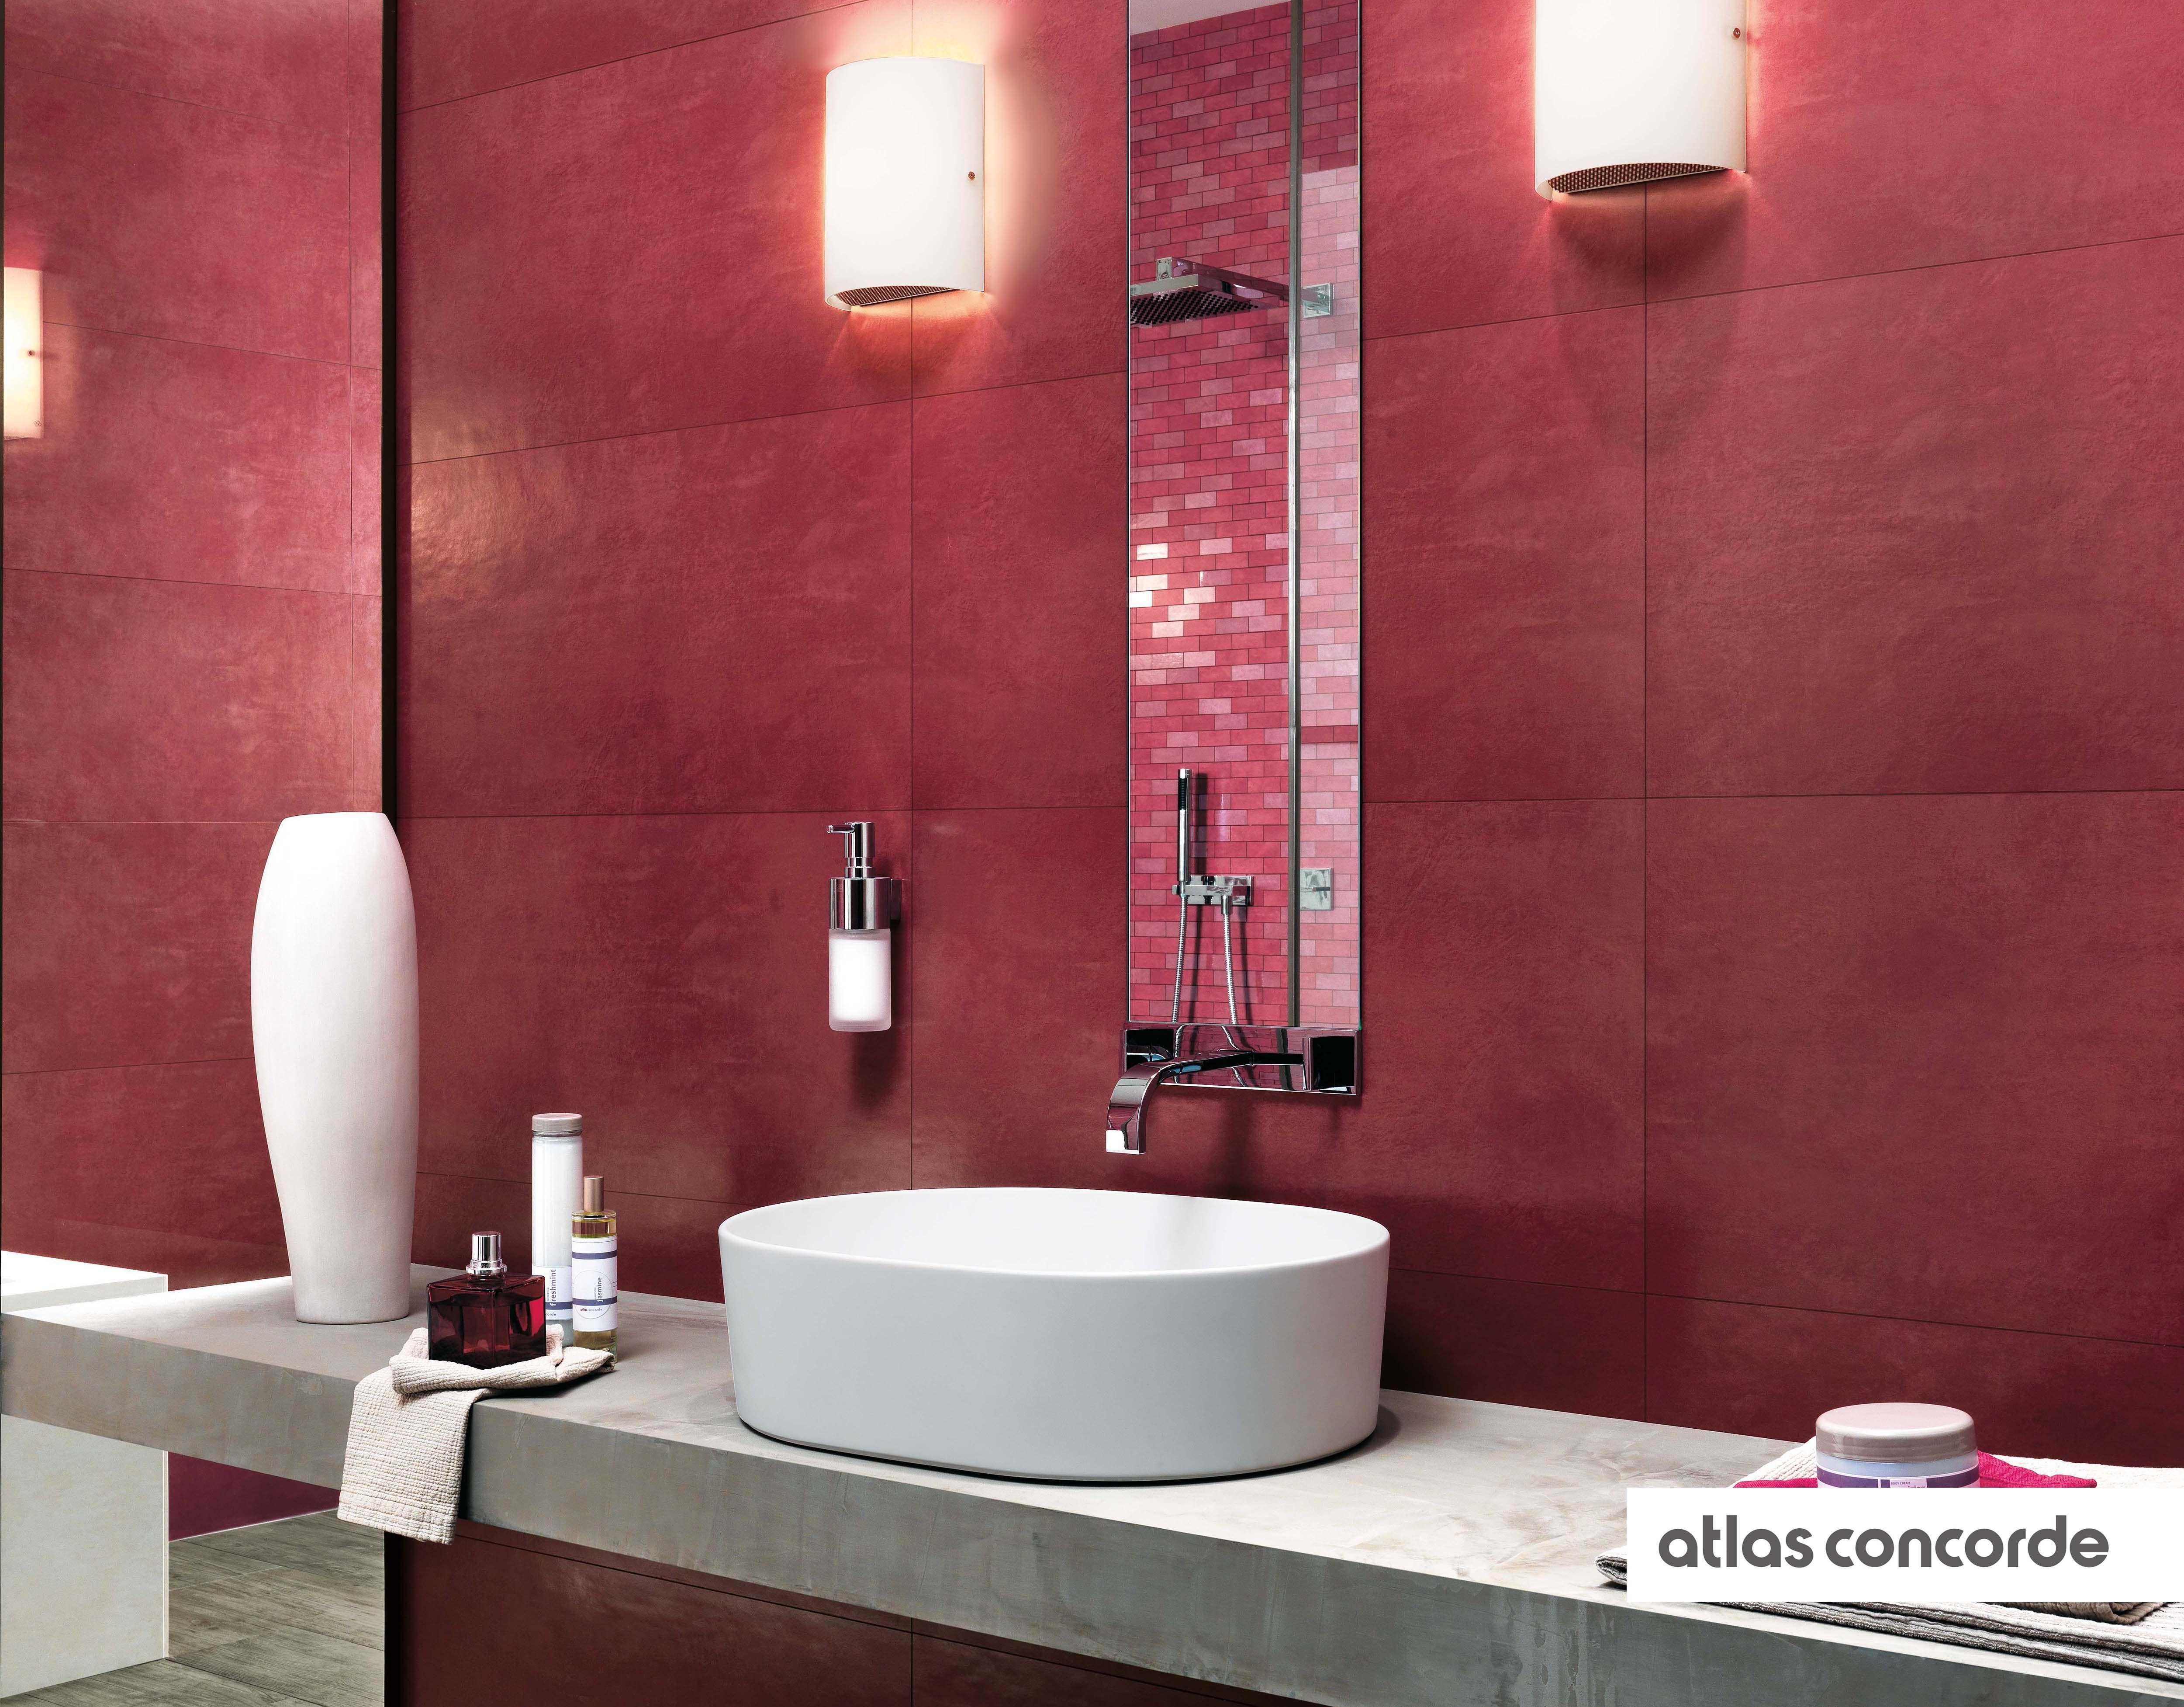 #EWALL amethyst | #AtlasConcorde | #Tiles | #Ceramic